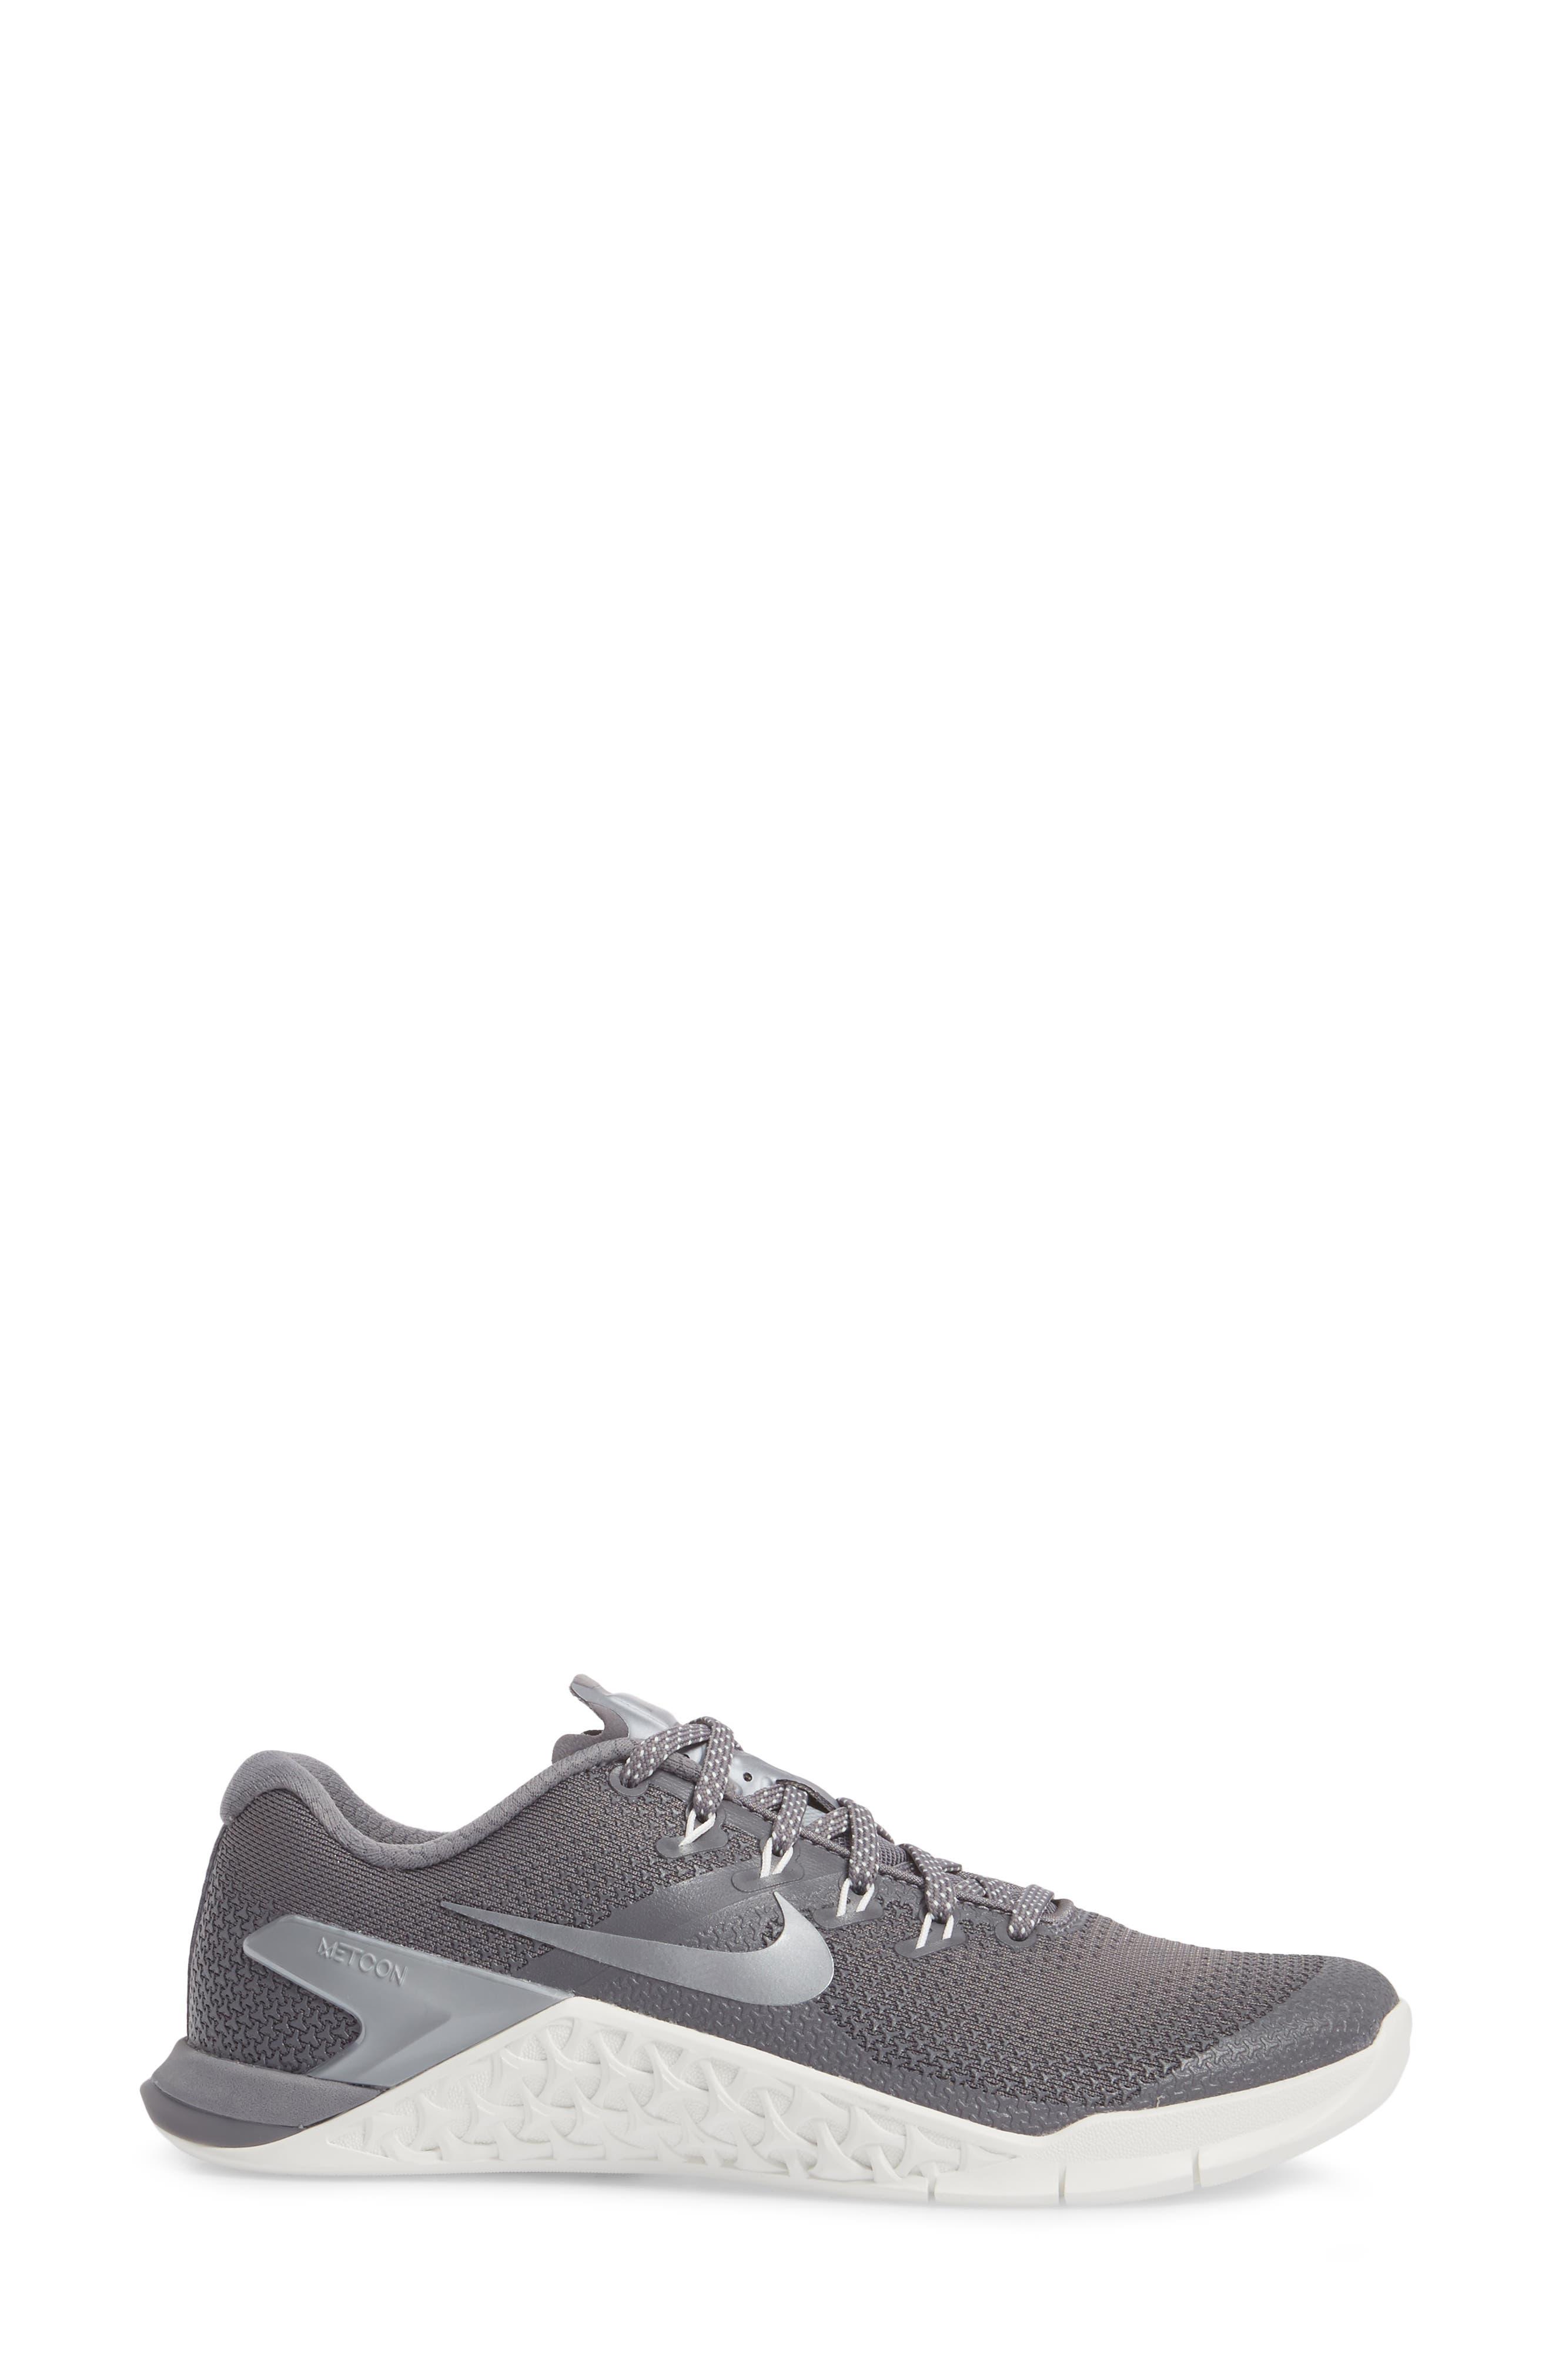 Metcon 4 Training Shoe,                             Alternate thumbnail 19, color,